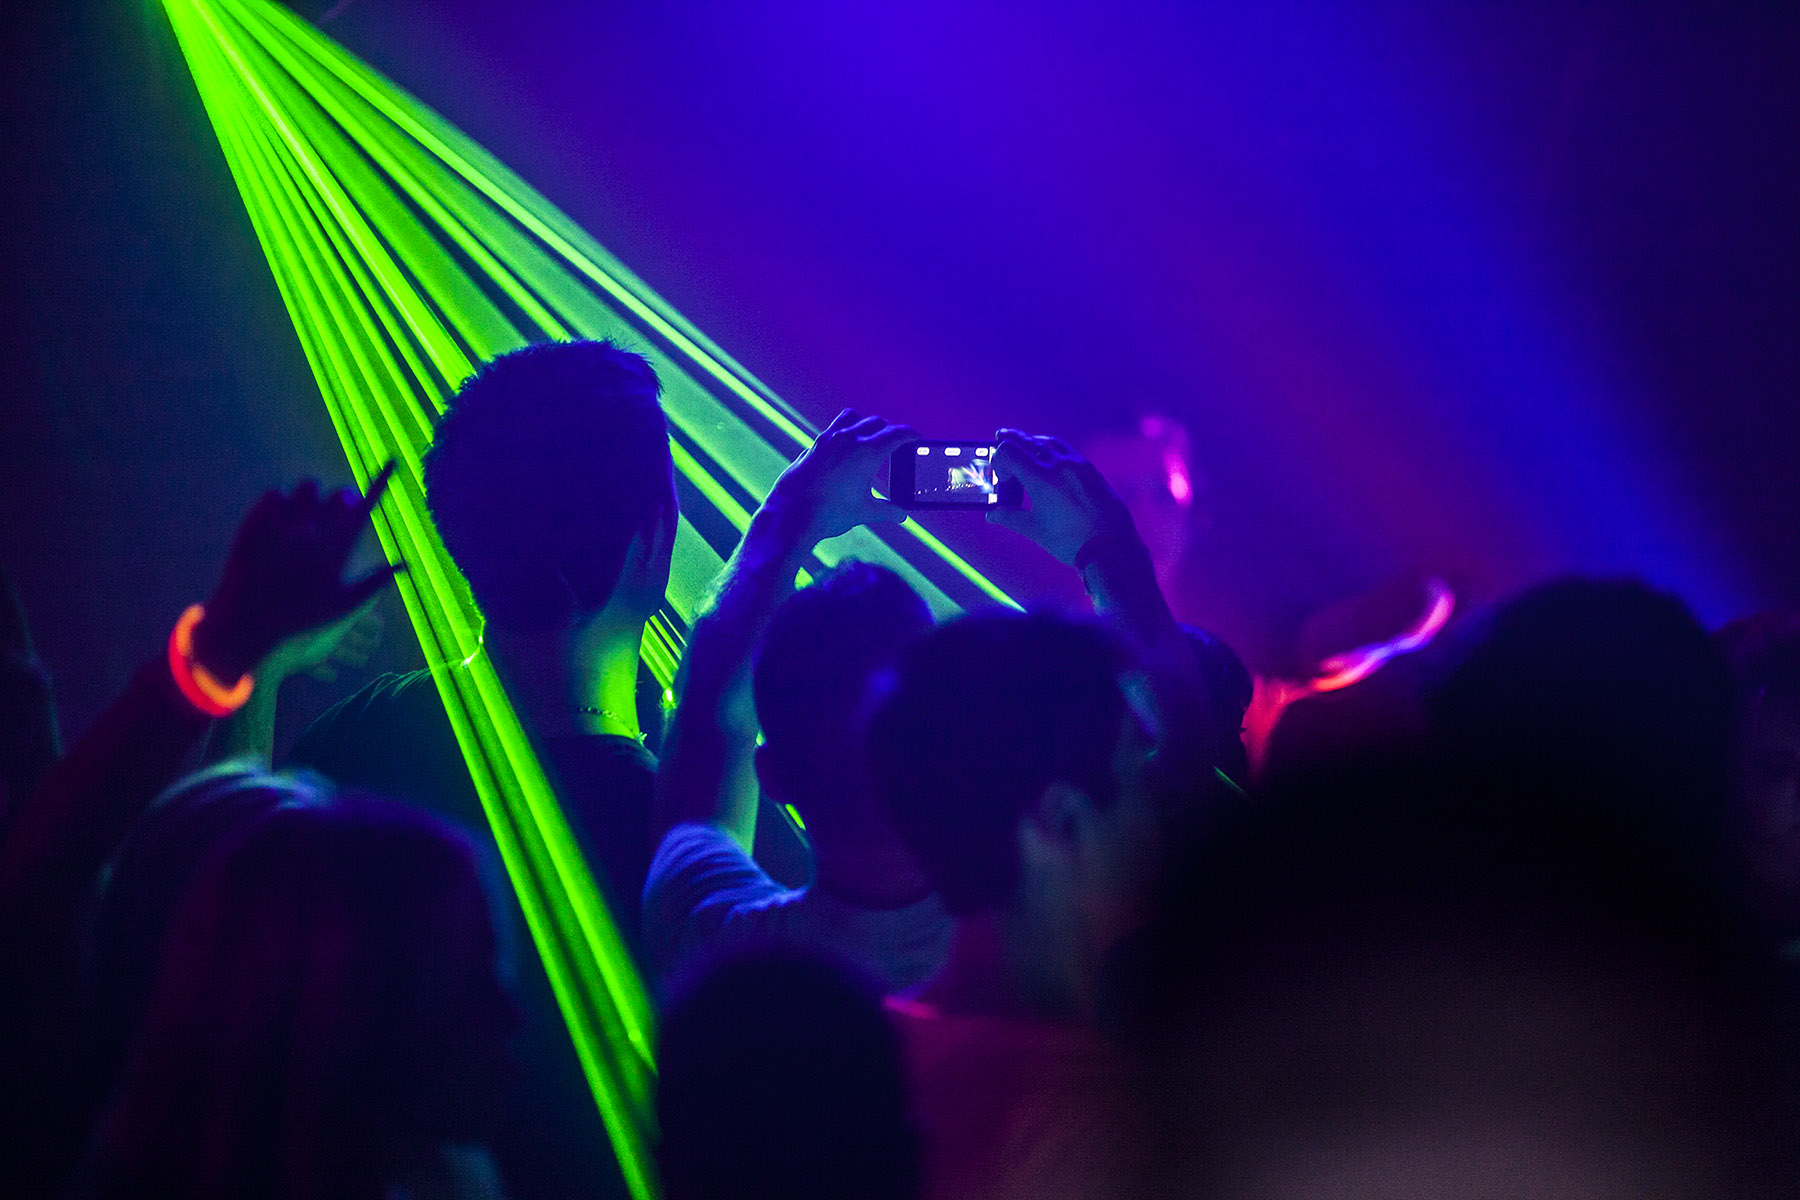 rave concert laser crowd concerts people music wallpaper